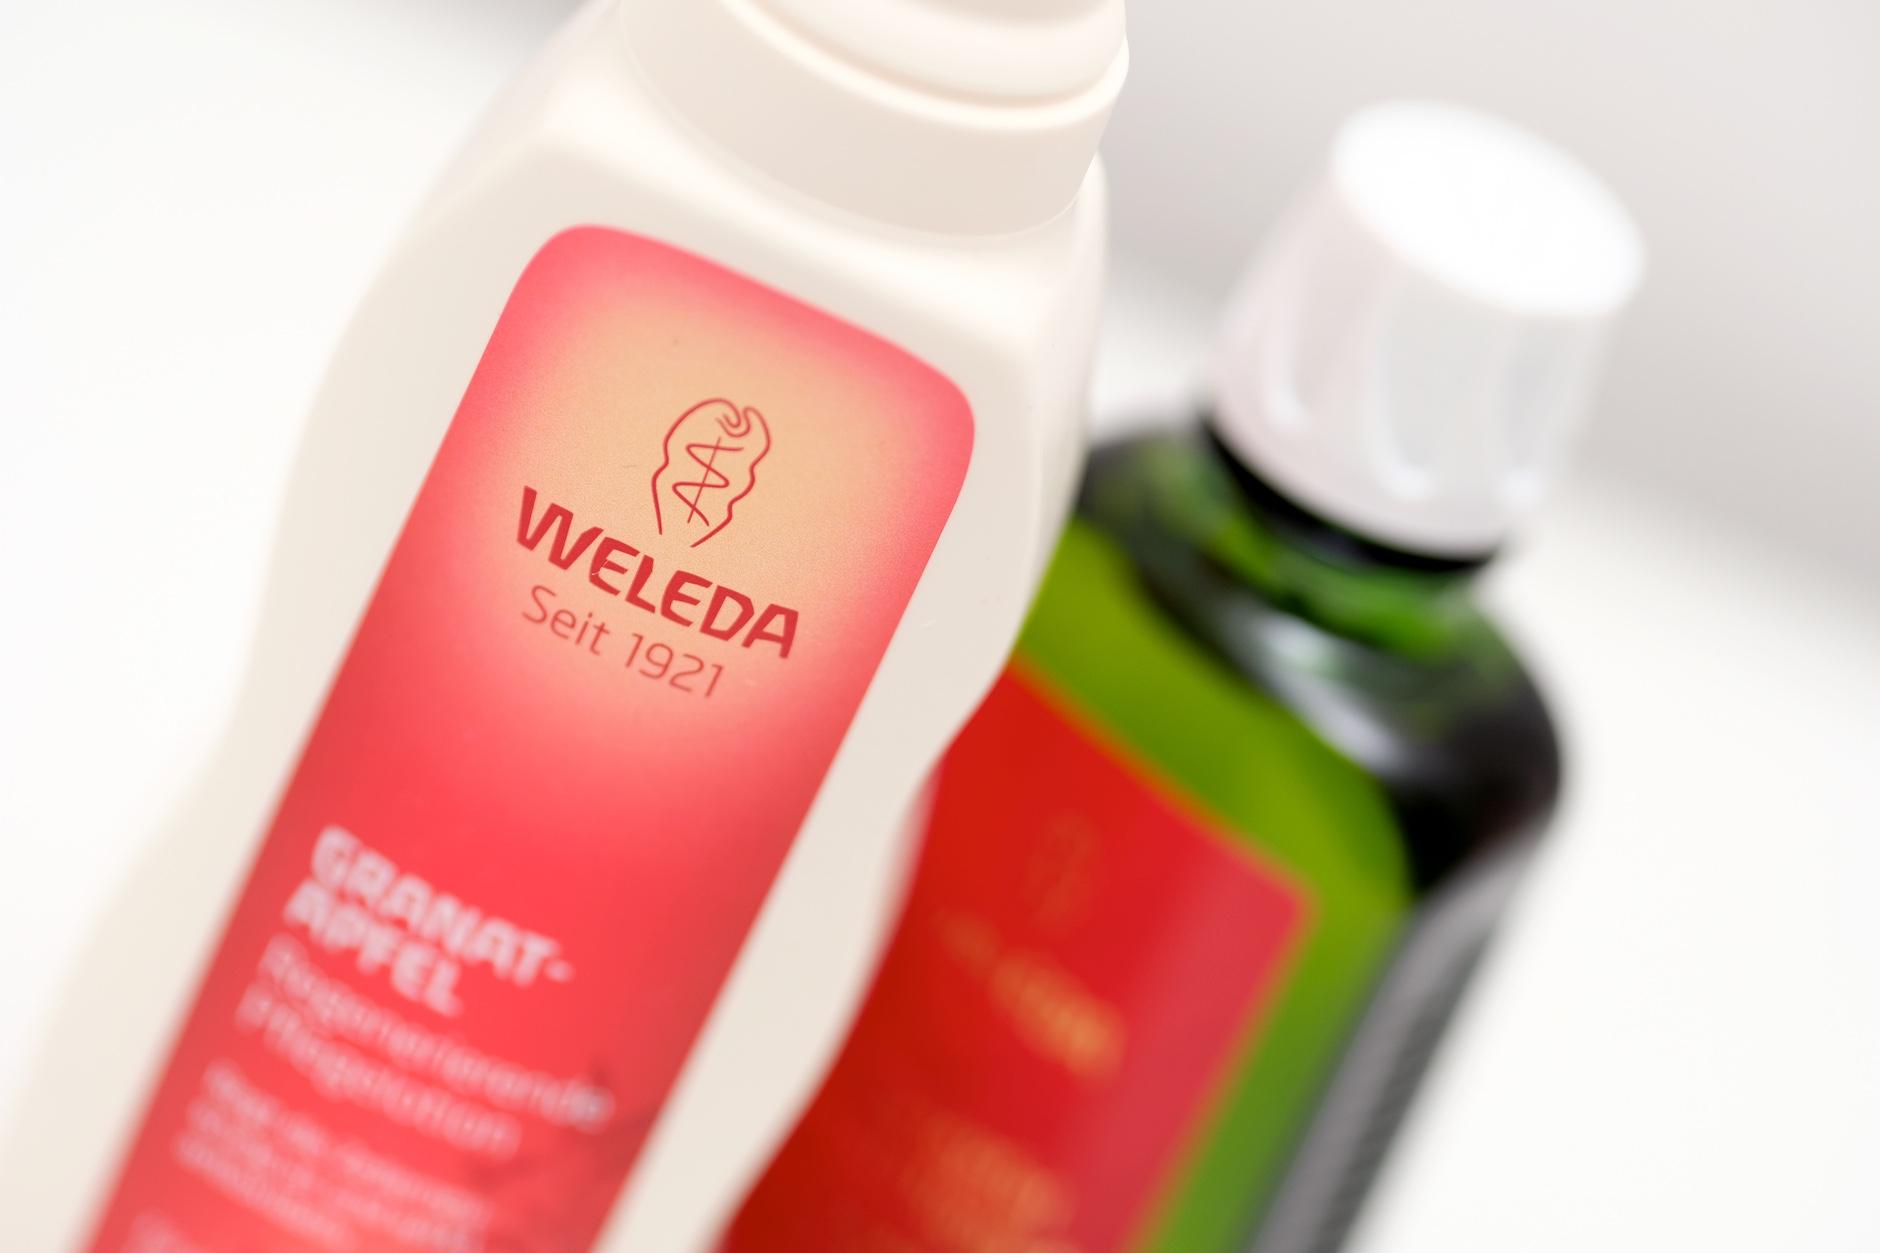 weleda-granatapfel-pflege-5